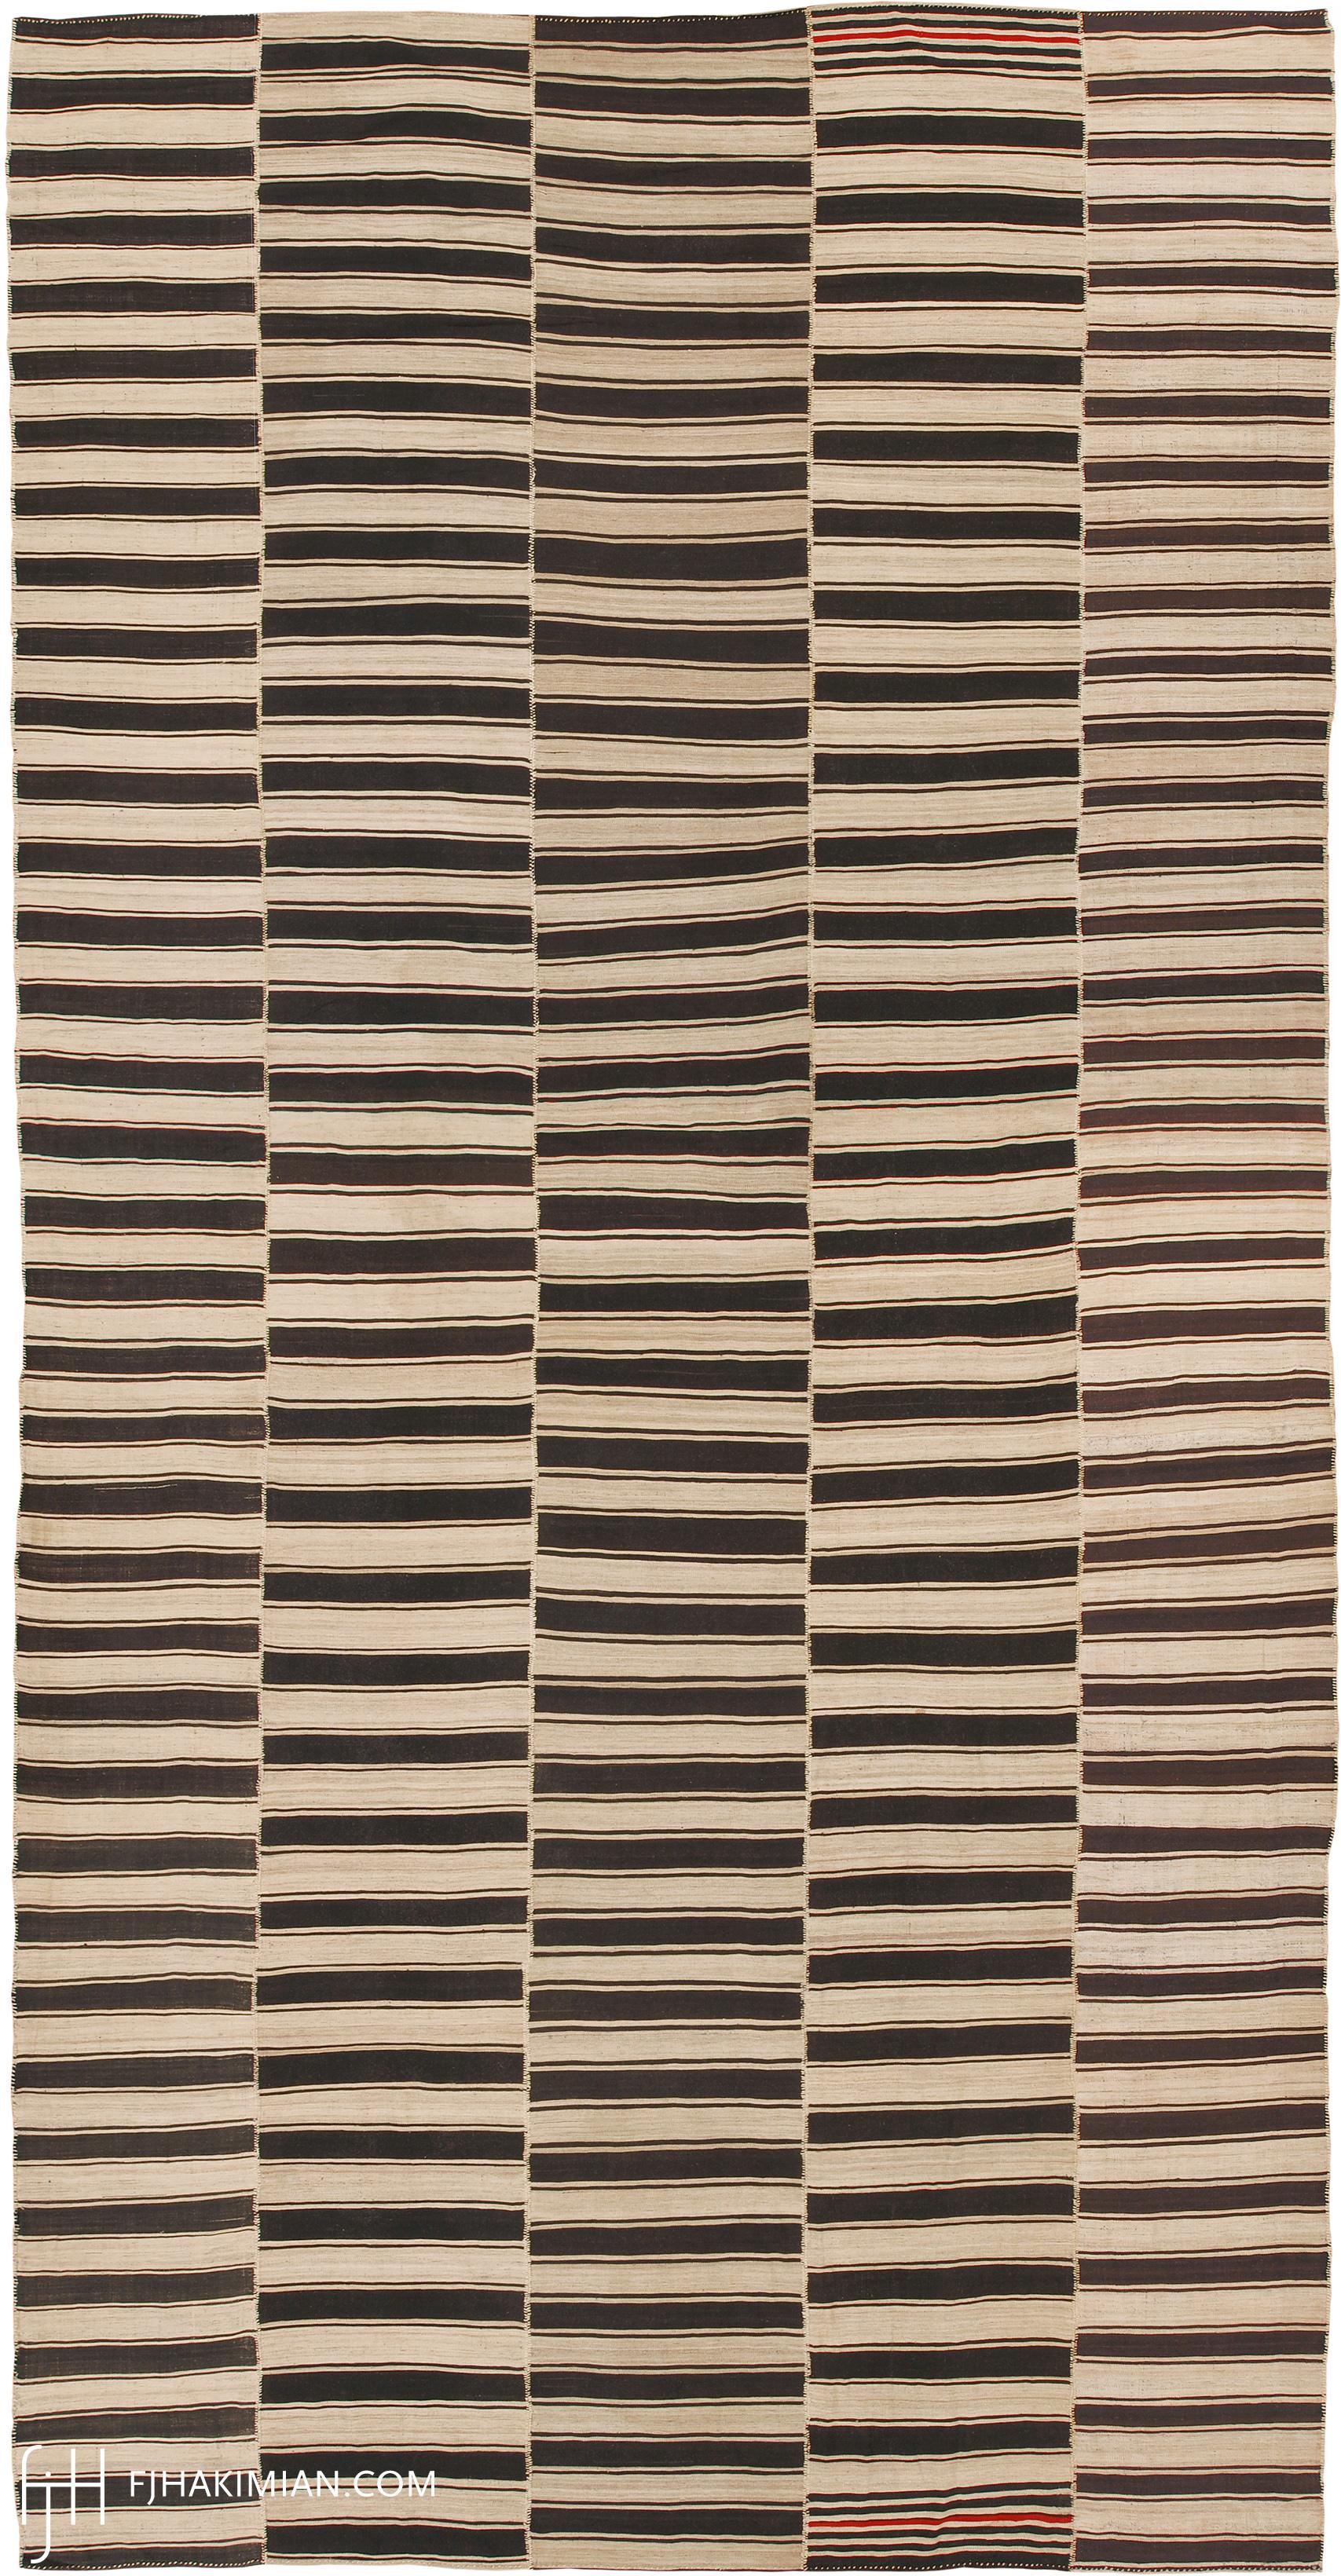 23042 Vintage Kilim Composition | FJ Hakimian